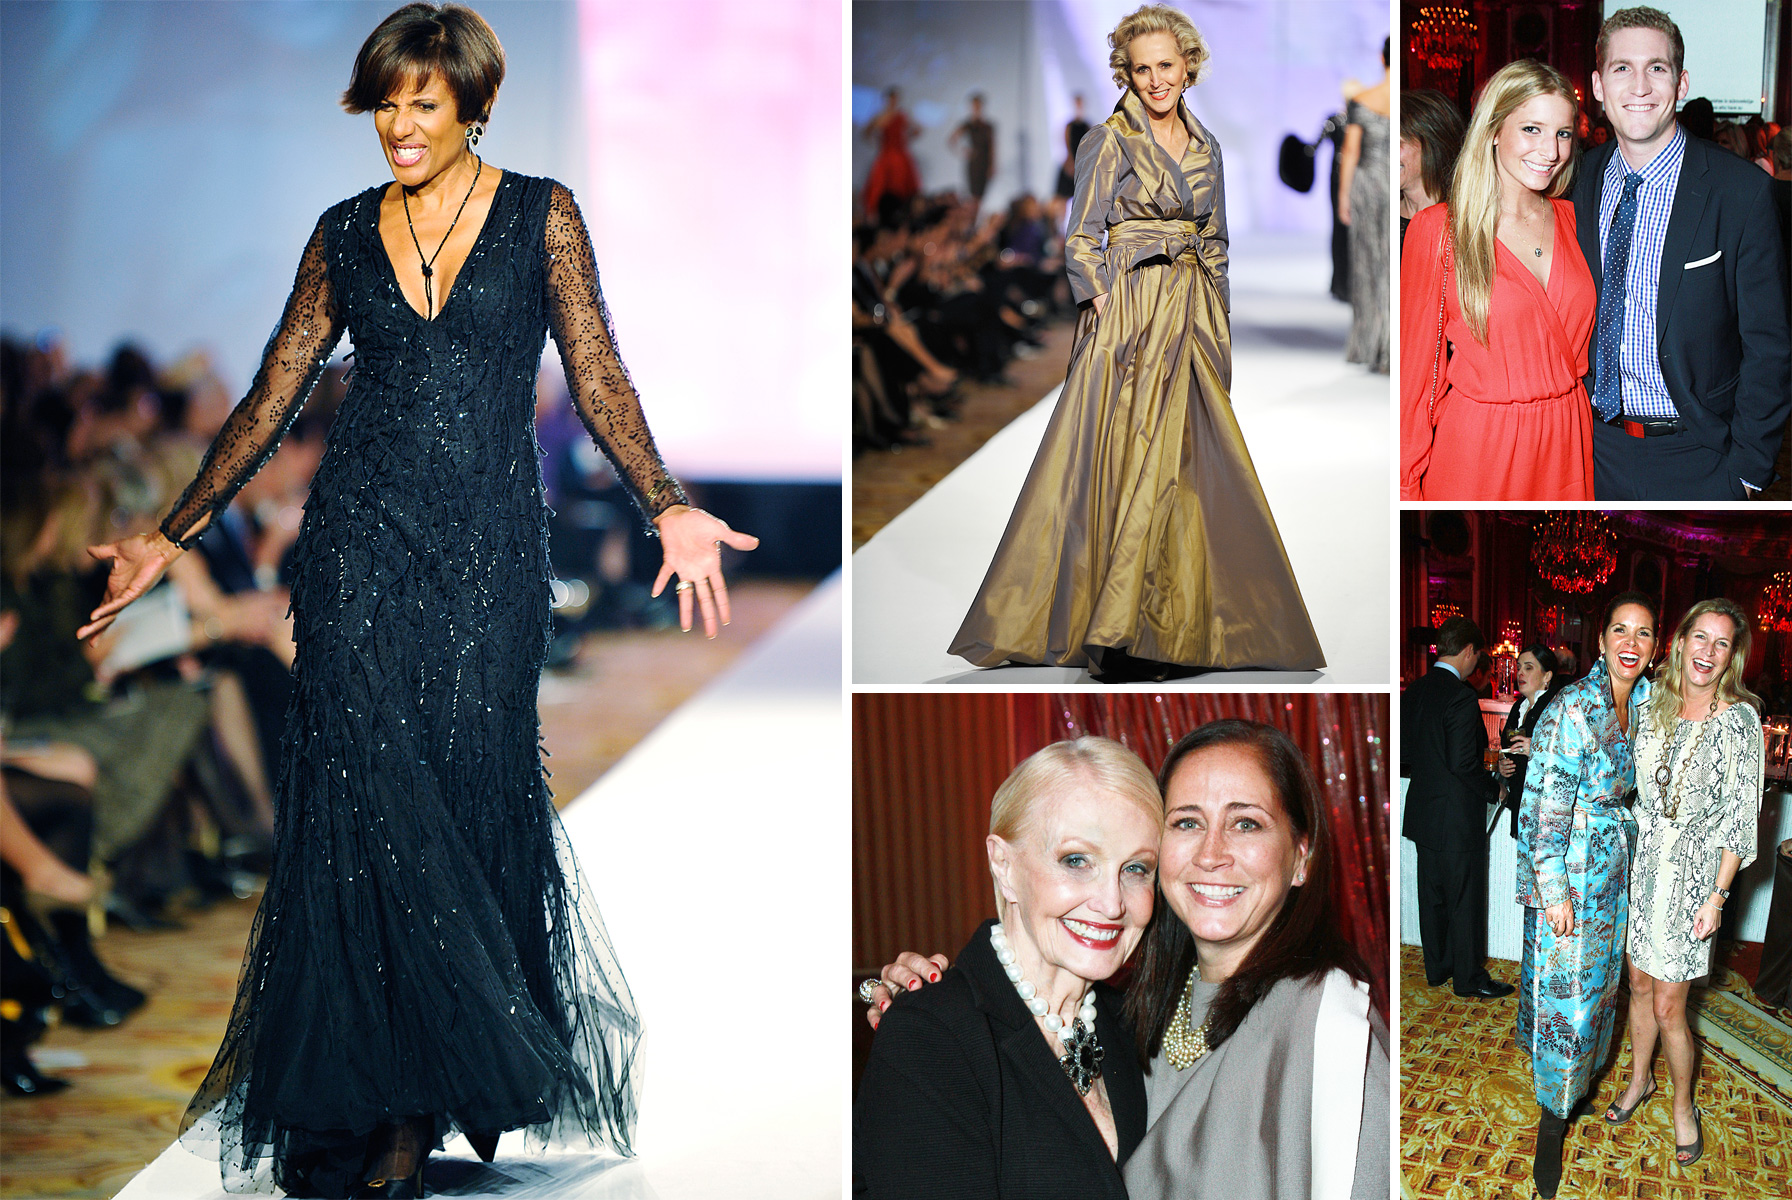 The Rush Women's Board Fashion Show, shot for the Chicago Sun-Times SPLASH lifestyle magazine